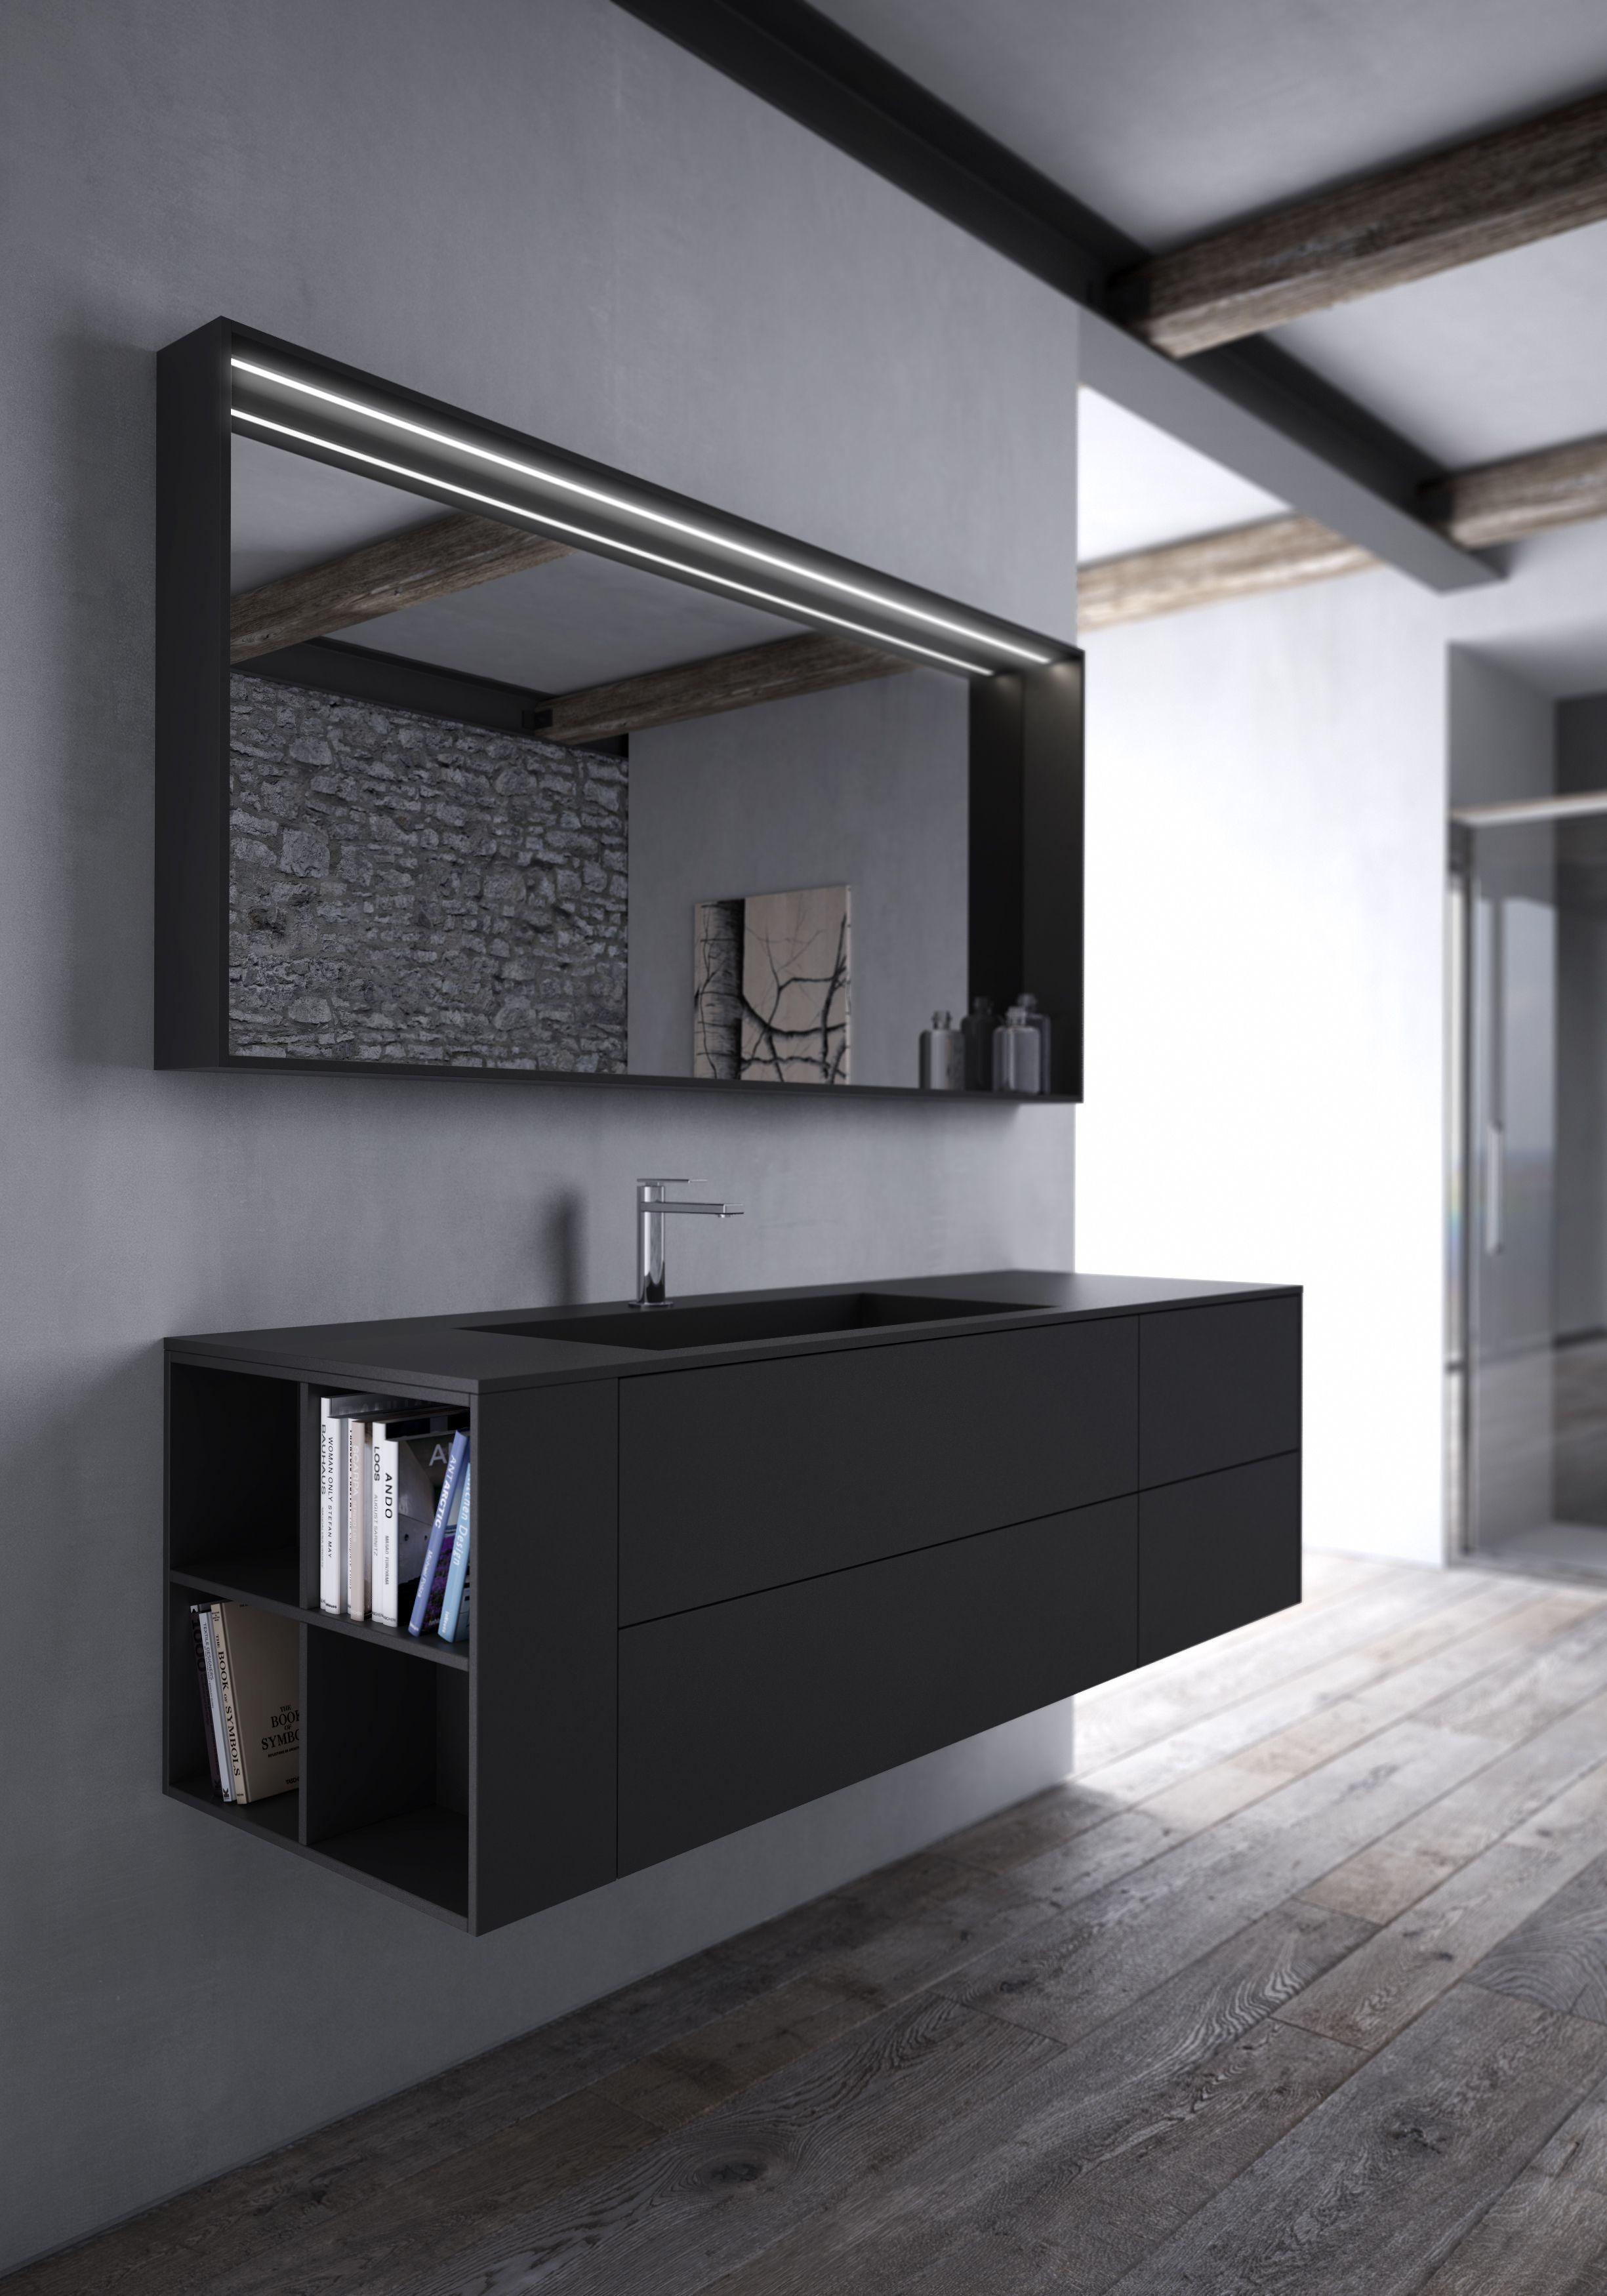 Salle De Bain Idea Group ~ mobilier salle de bain sense idea group en fenix ntm aaa corinne